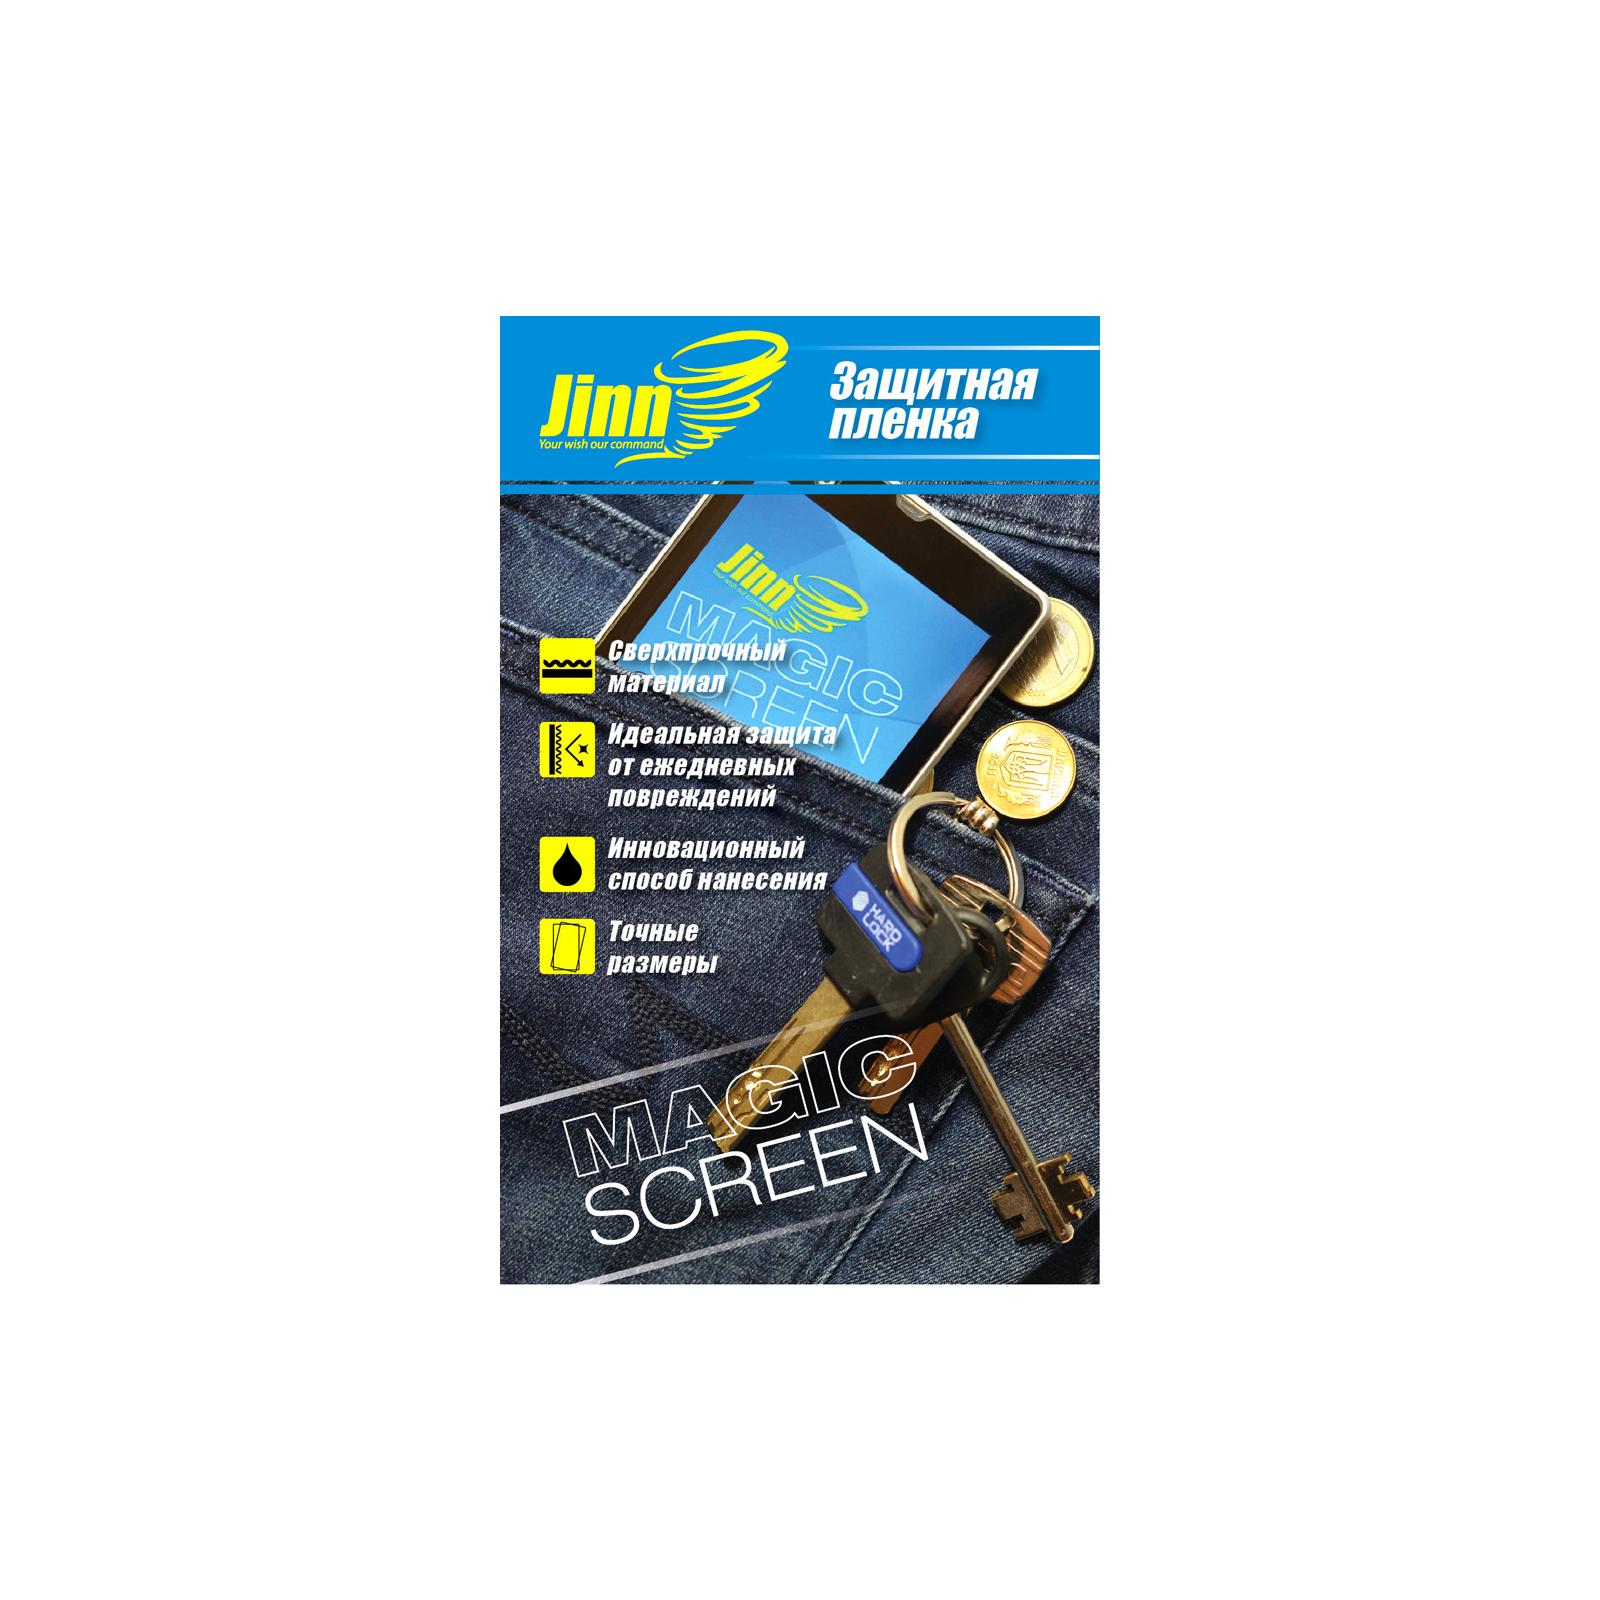 Пленка защитная JINN ультрапрочная Magic Screen для LG Optimus L9 P765 (LG Optimus L9 front)